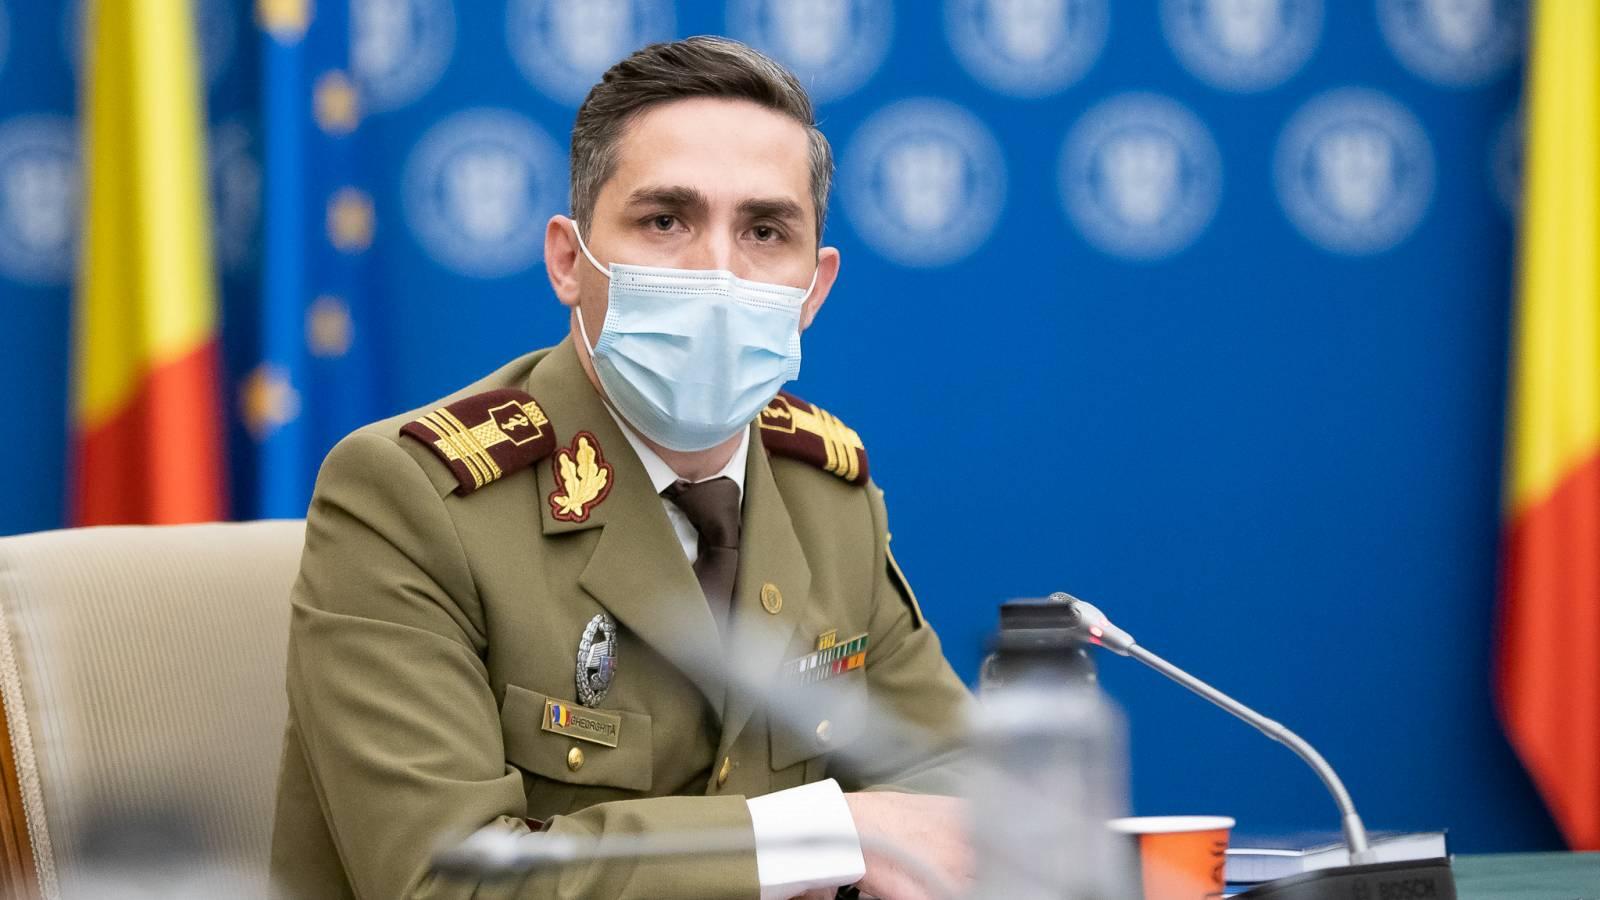 Valeriu Gheorghita Cand Incepe Valul 4 Coronavirus Romania